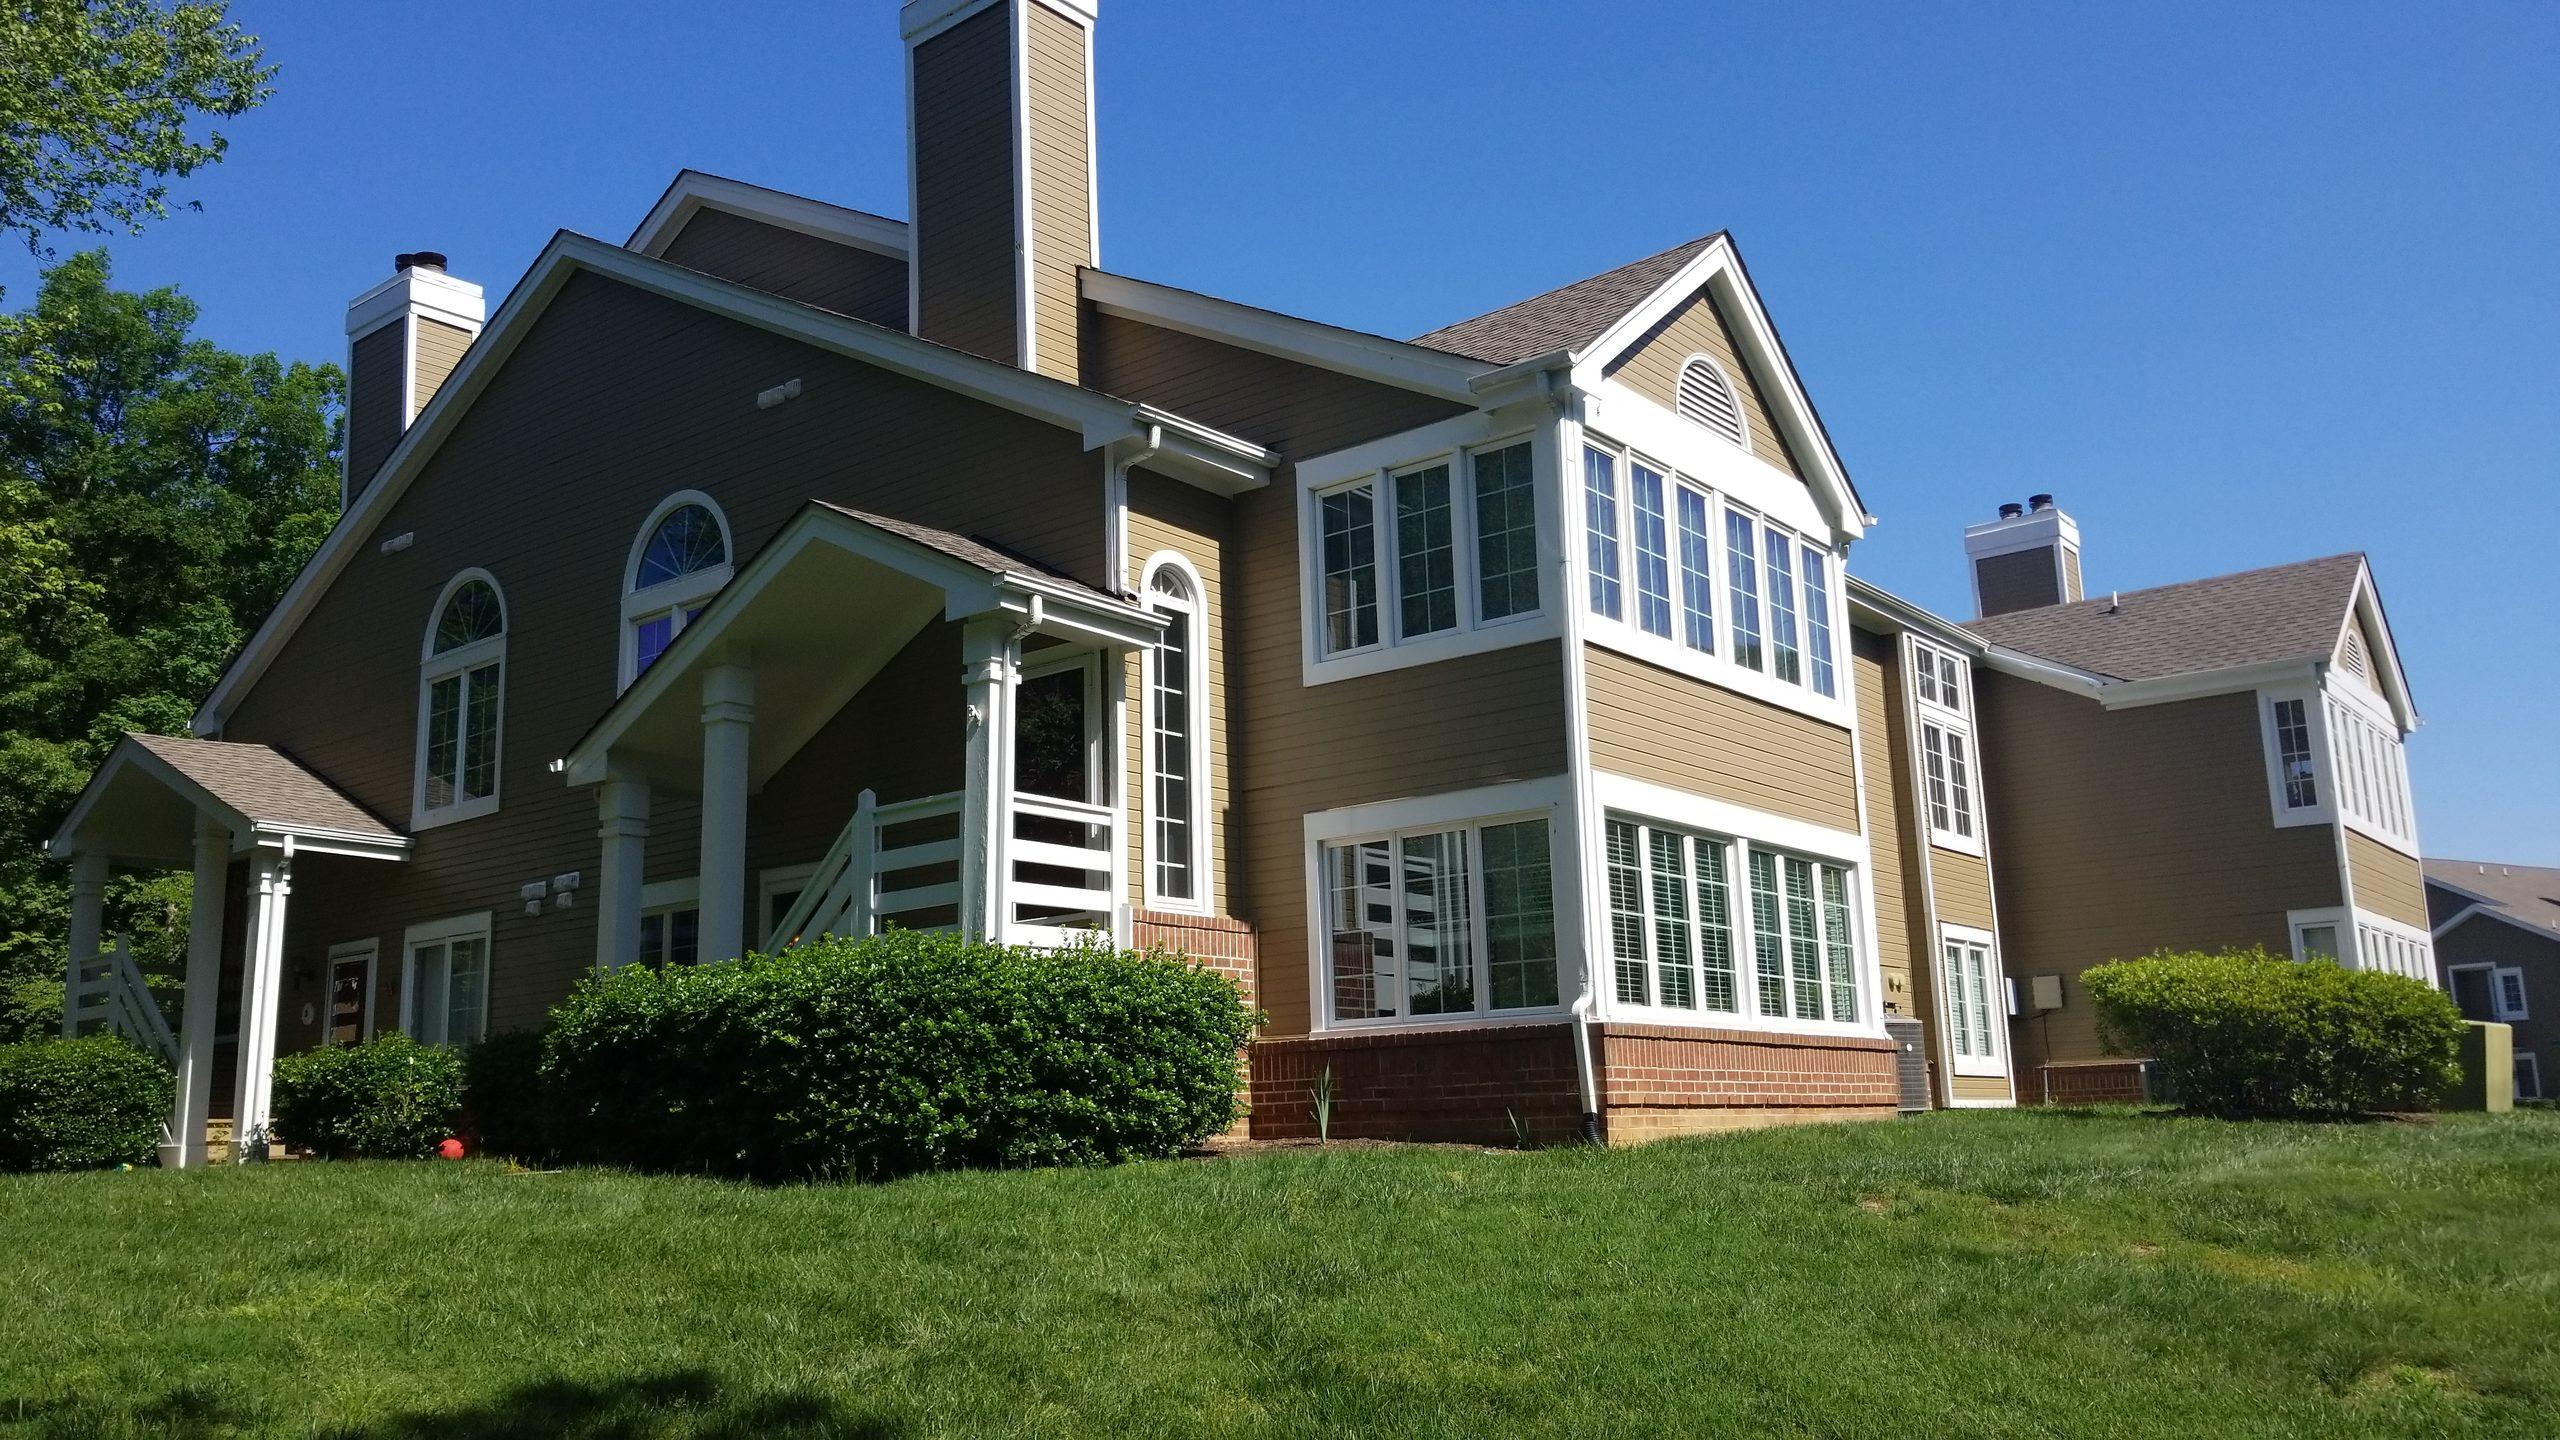 Innsbrook Condo @ 4651 Four Seasons Terrace #C, Glen Allen, VA 23060